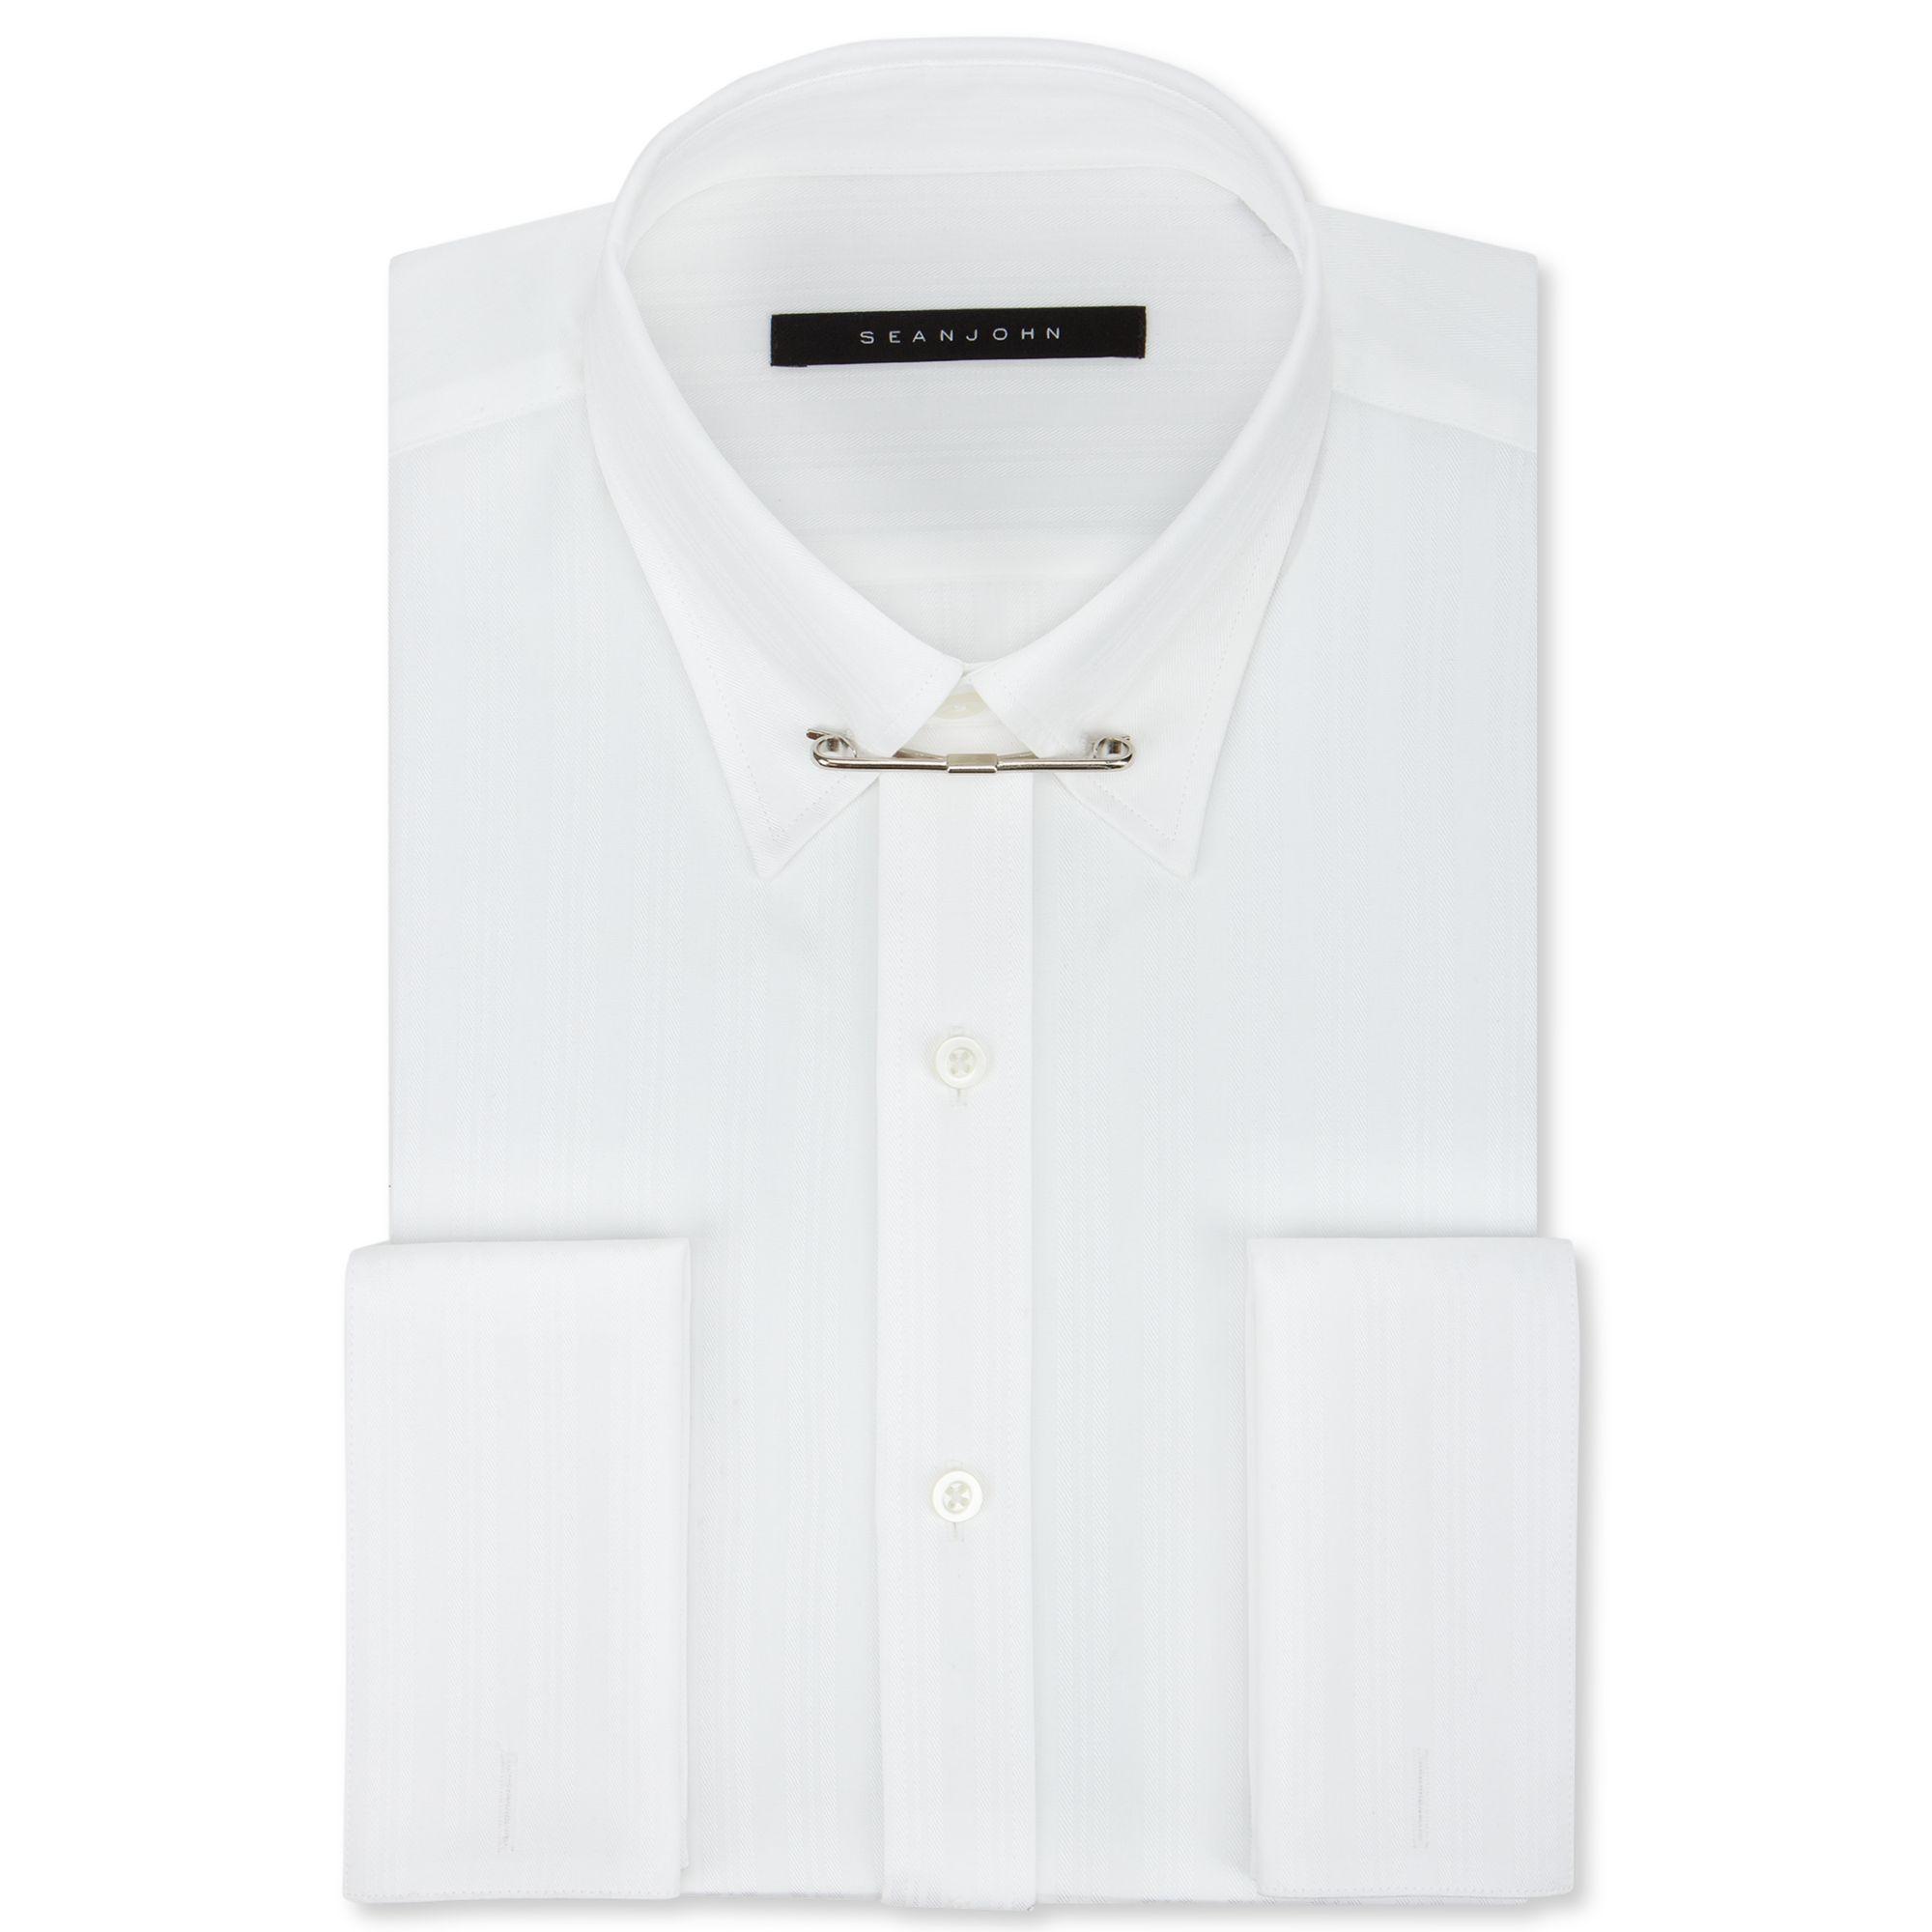 Sean john white texture french cuff shirt with collar bar for White french cuff shirt